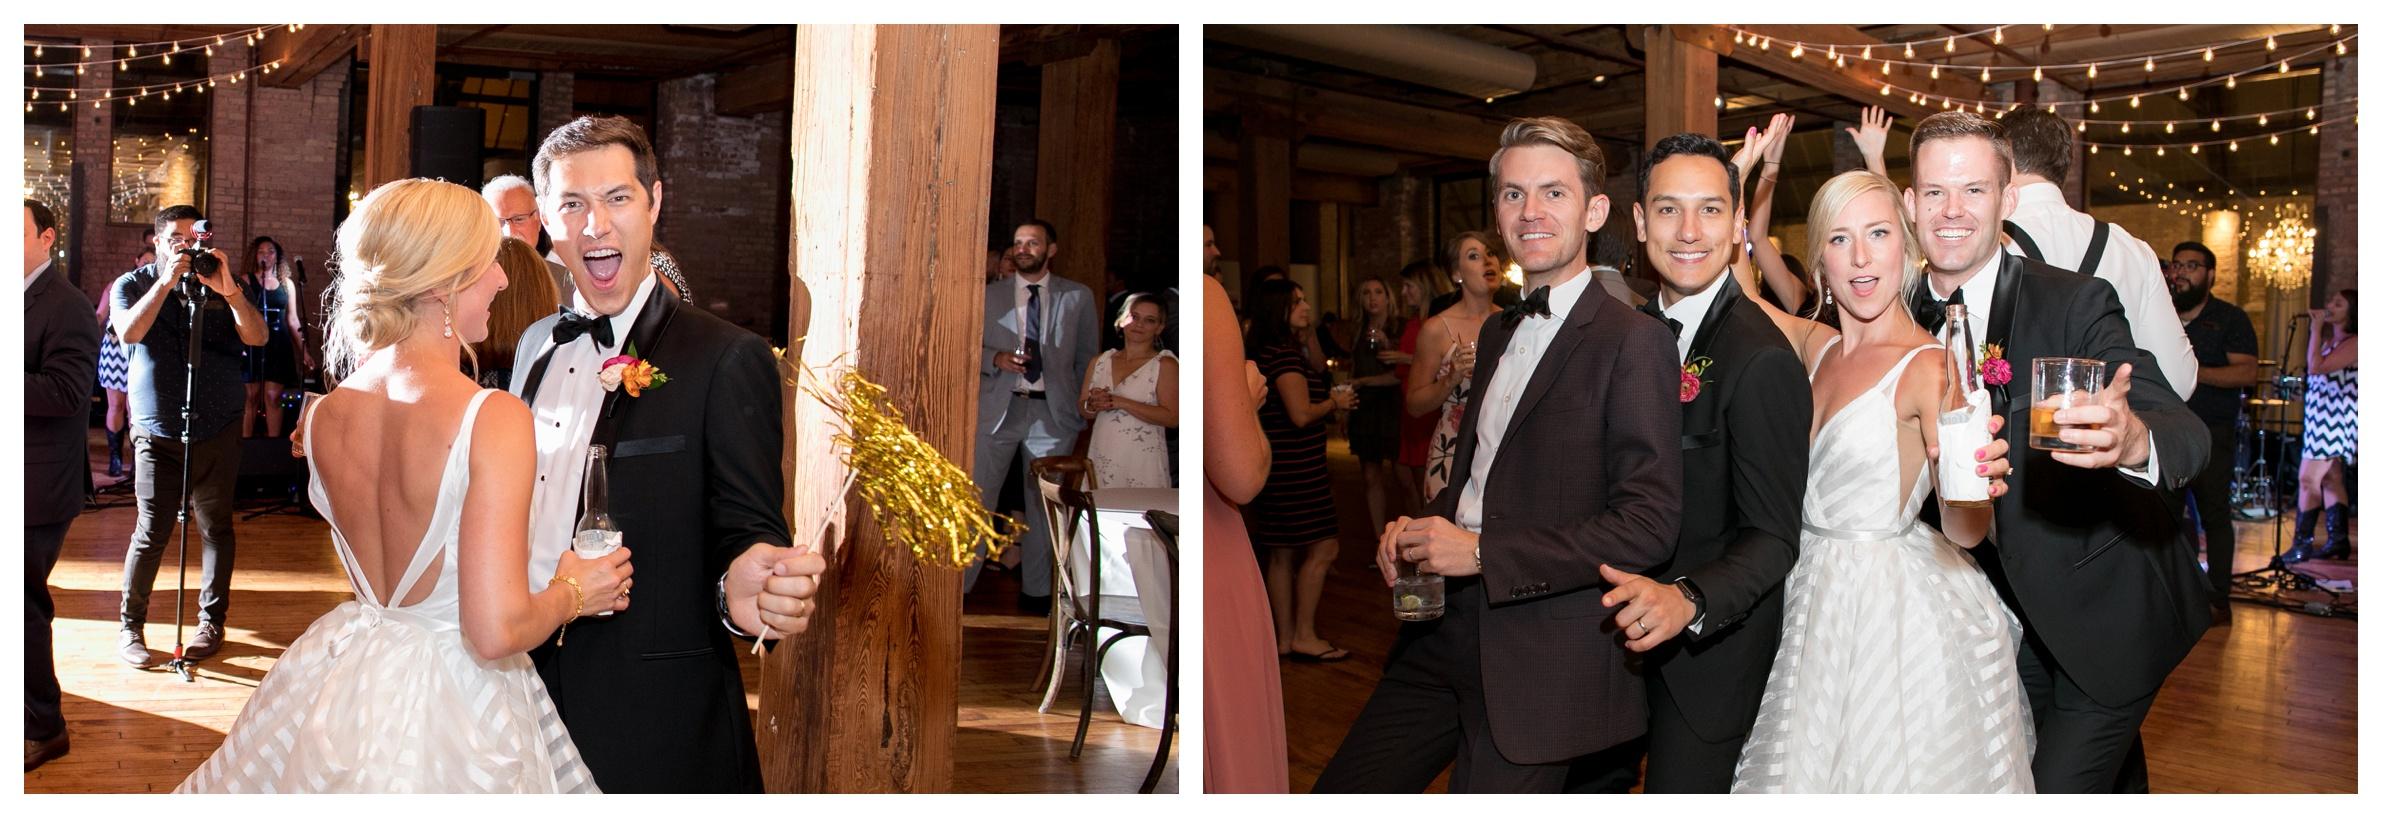 bridgeport-art-center-wedding-reception